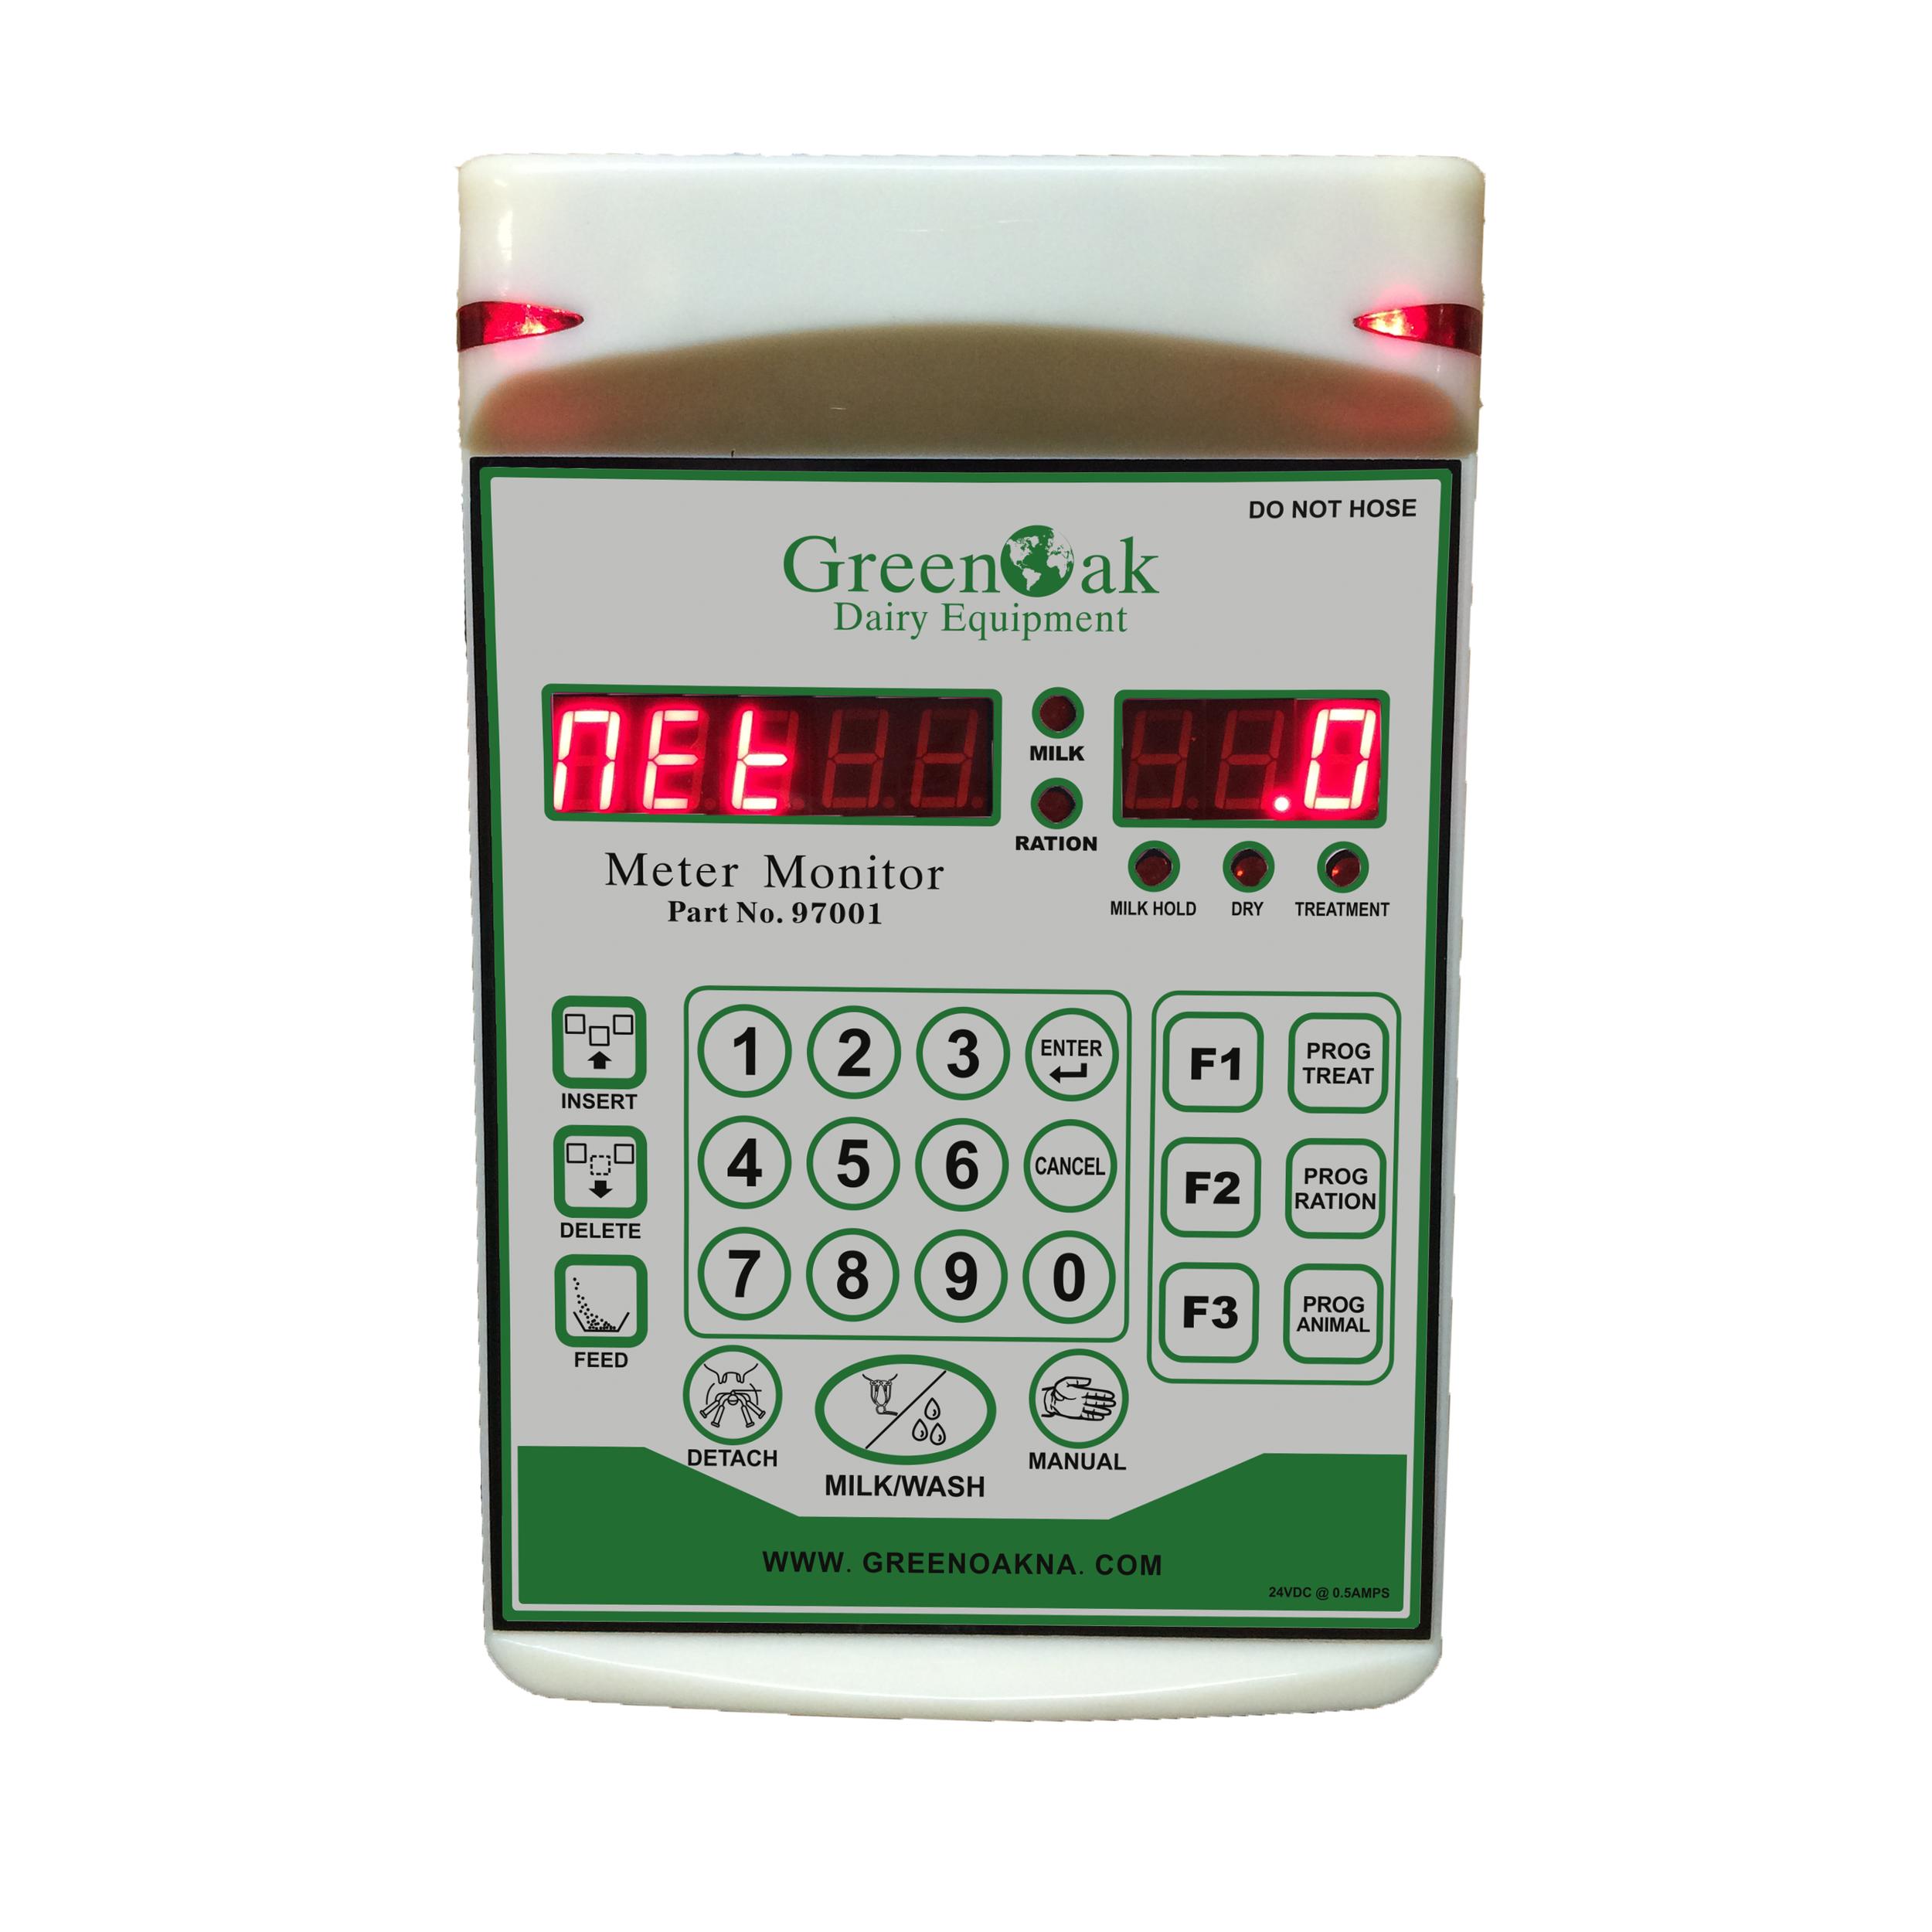 Meter Monitor 97001